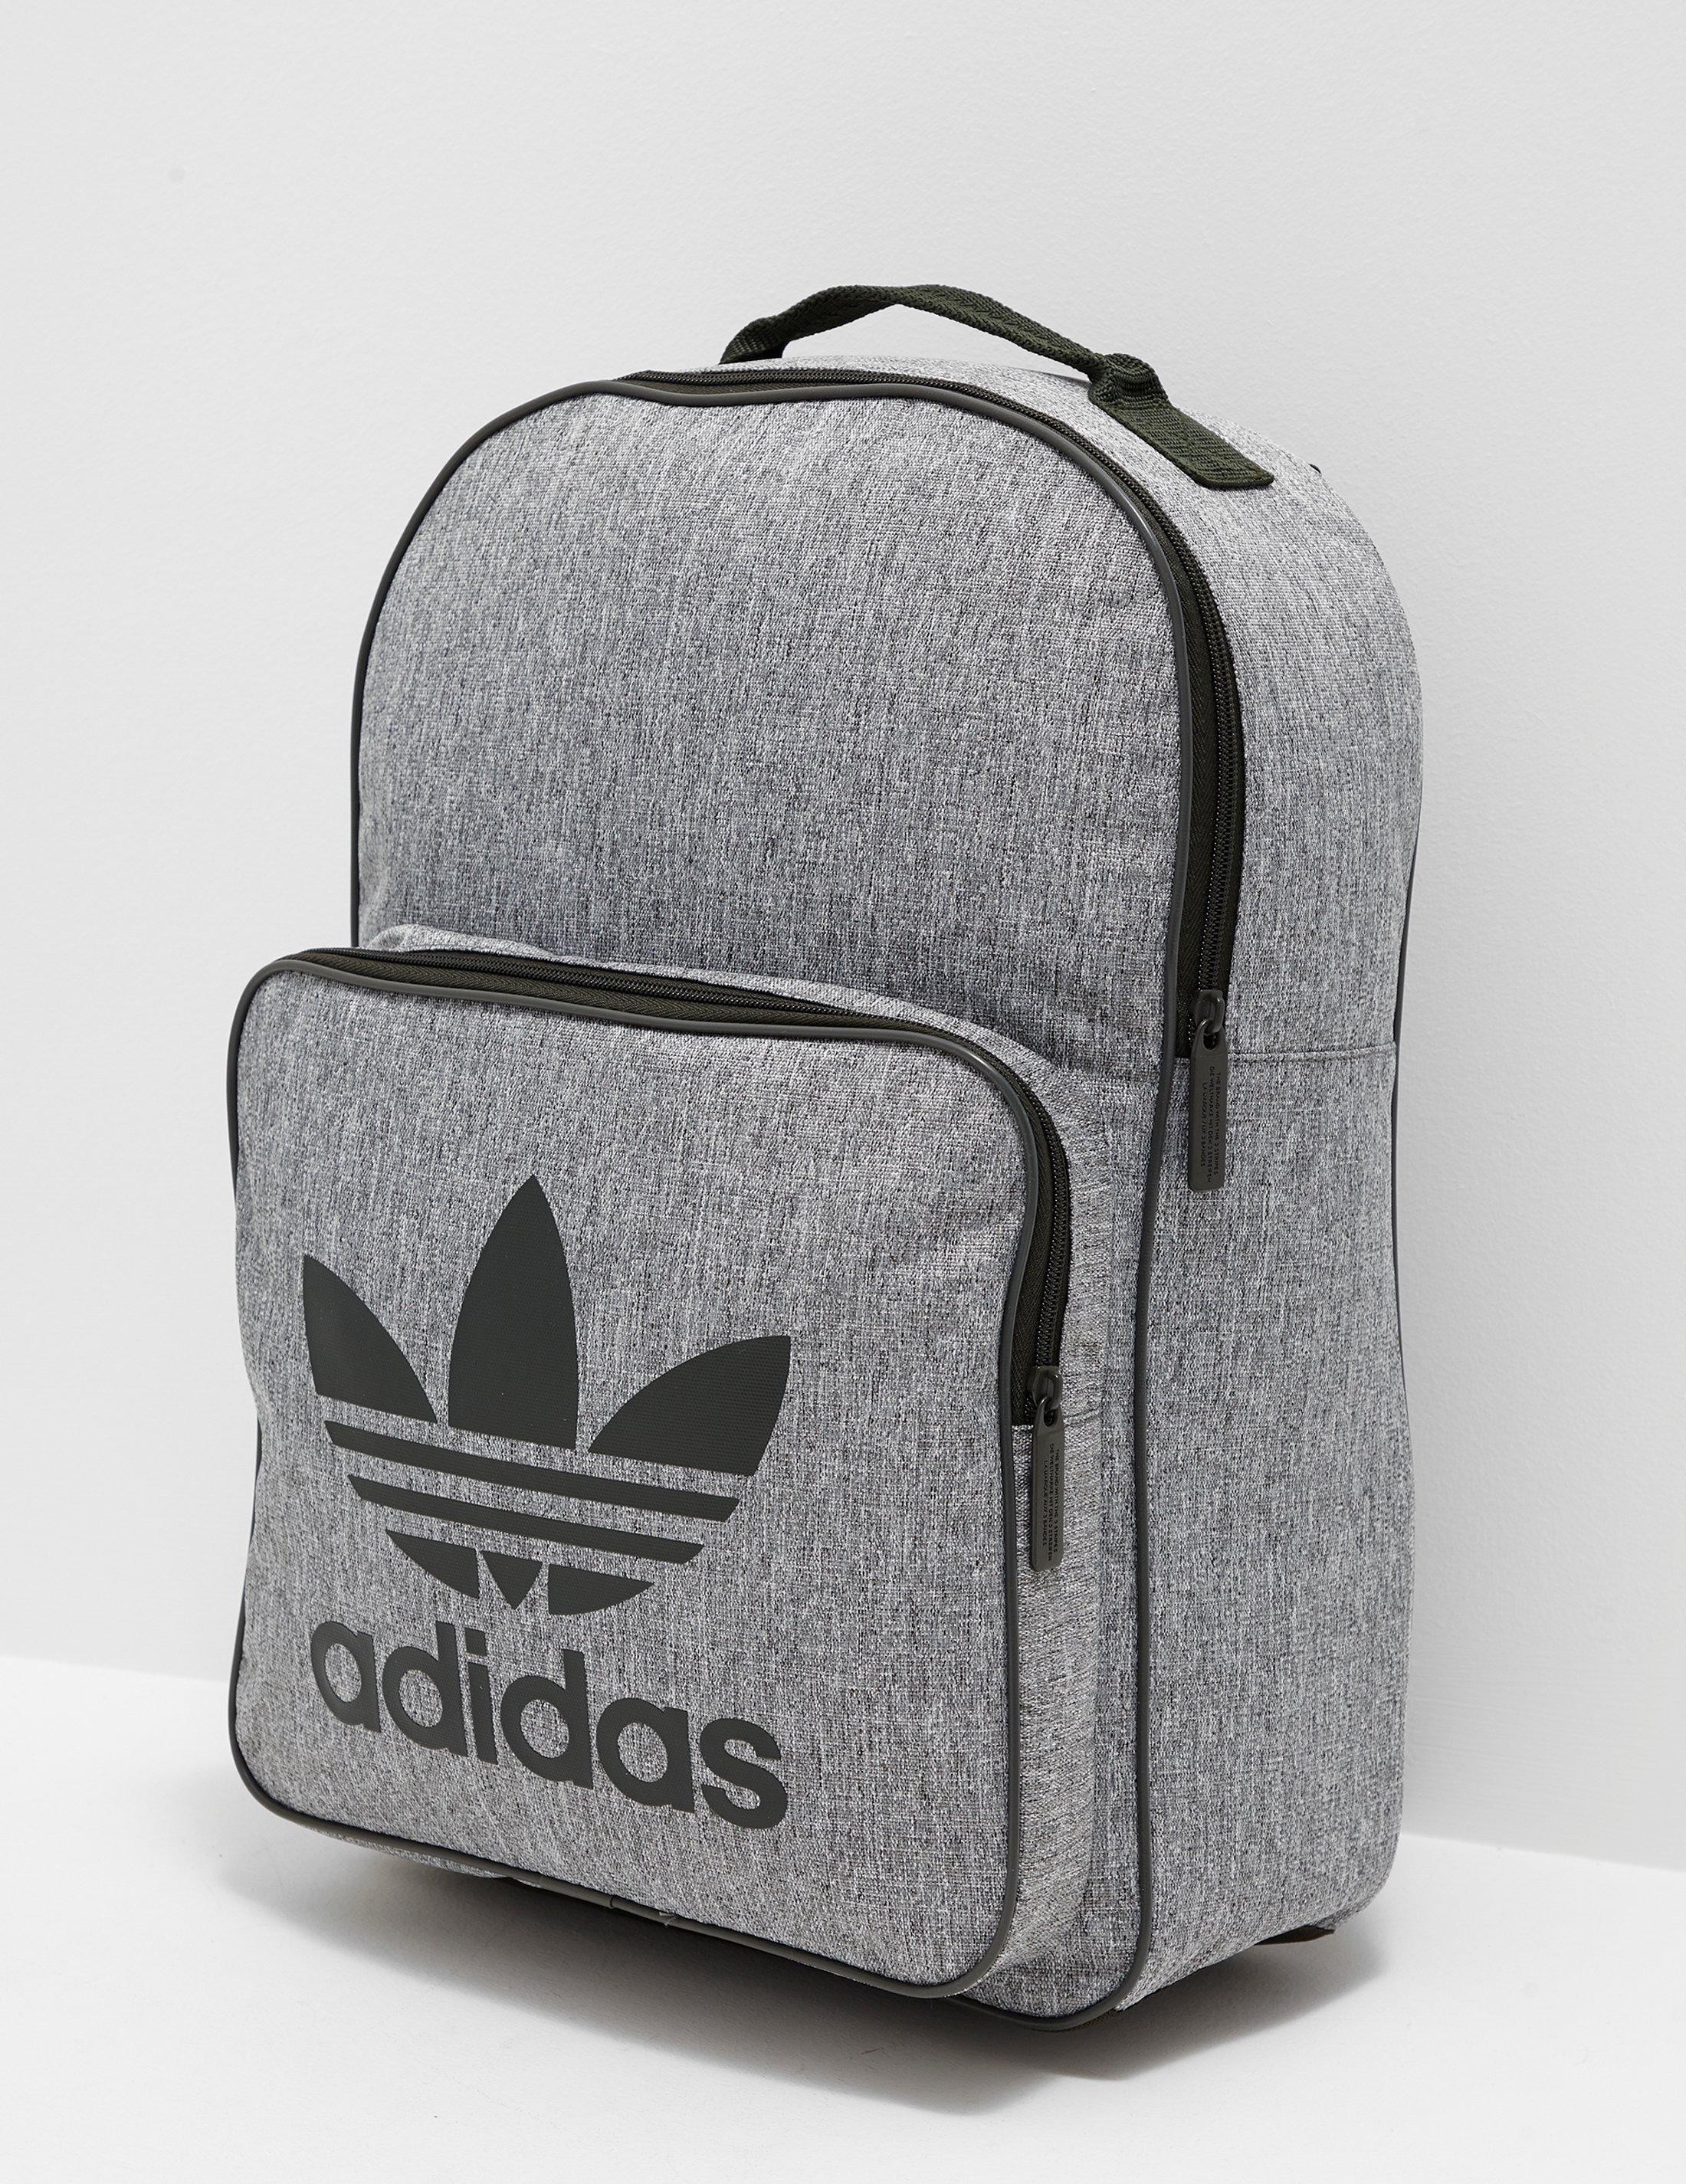 dcd9639f7b3d Lyst - adidas Originals Womens Trefoil Backpack Grey cargo